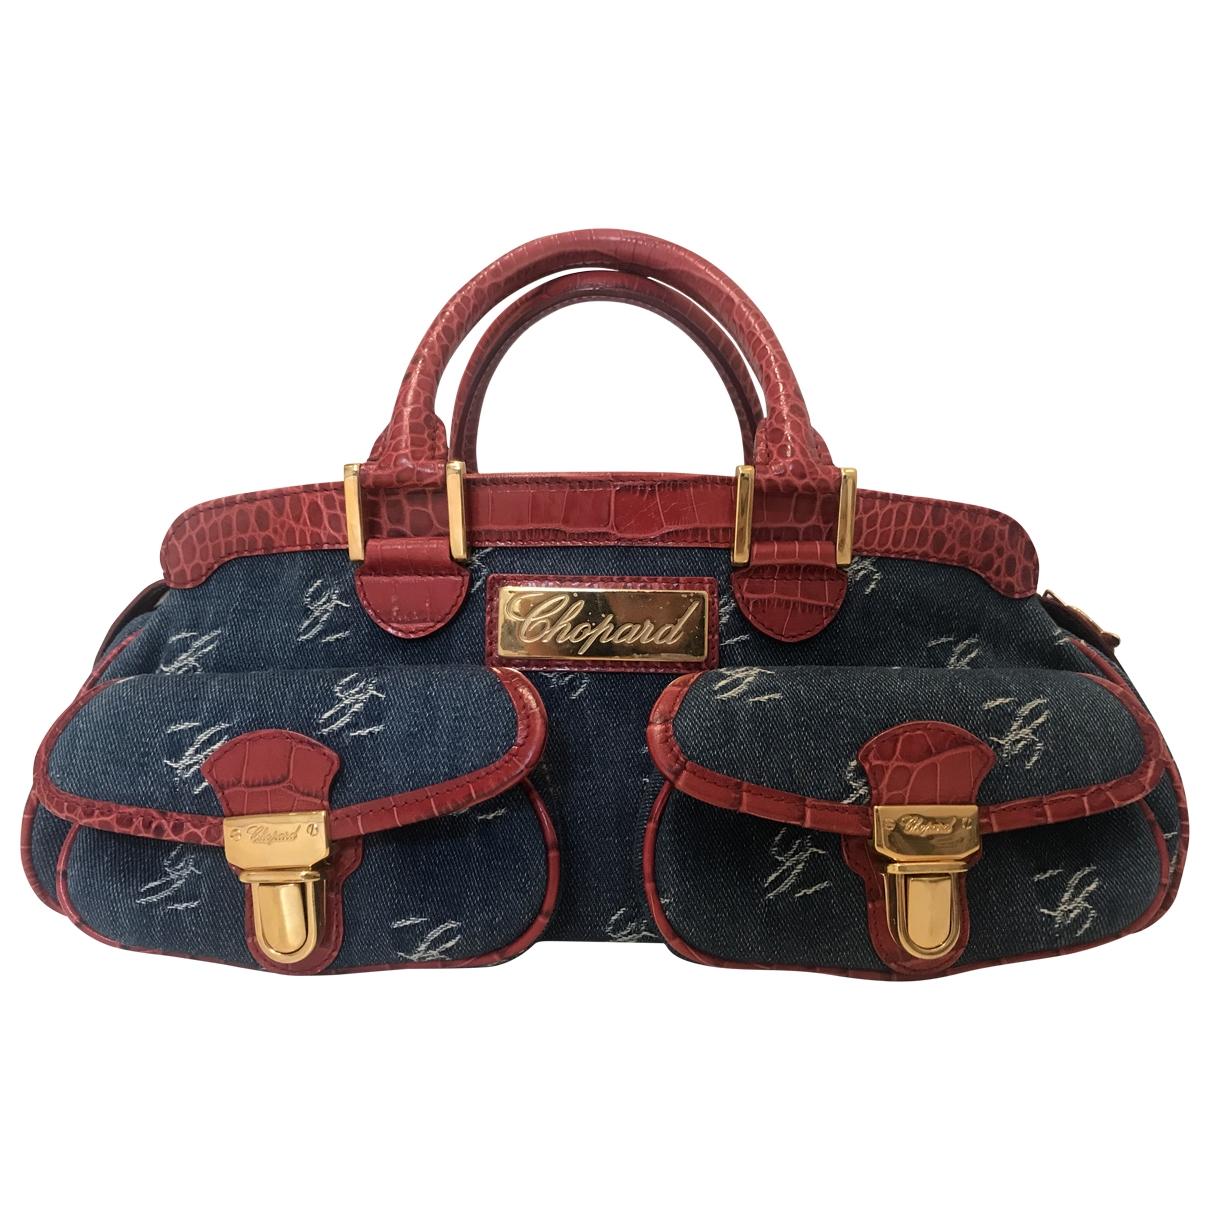 Chopard \N Blue Denim - Jeans handbag for Women \N